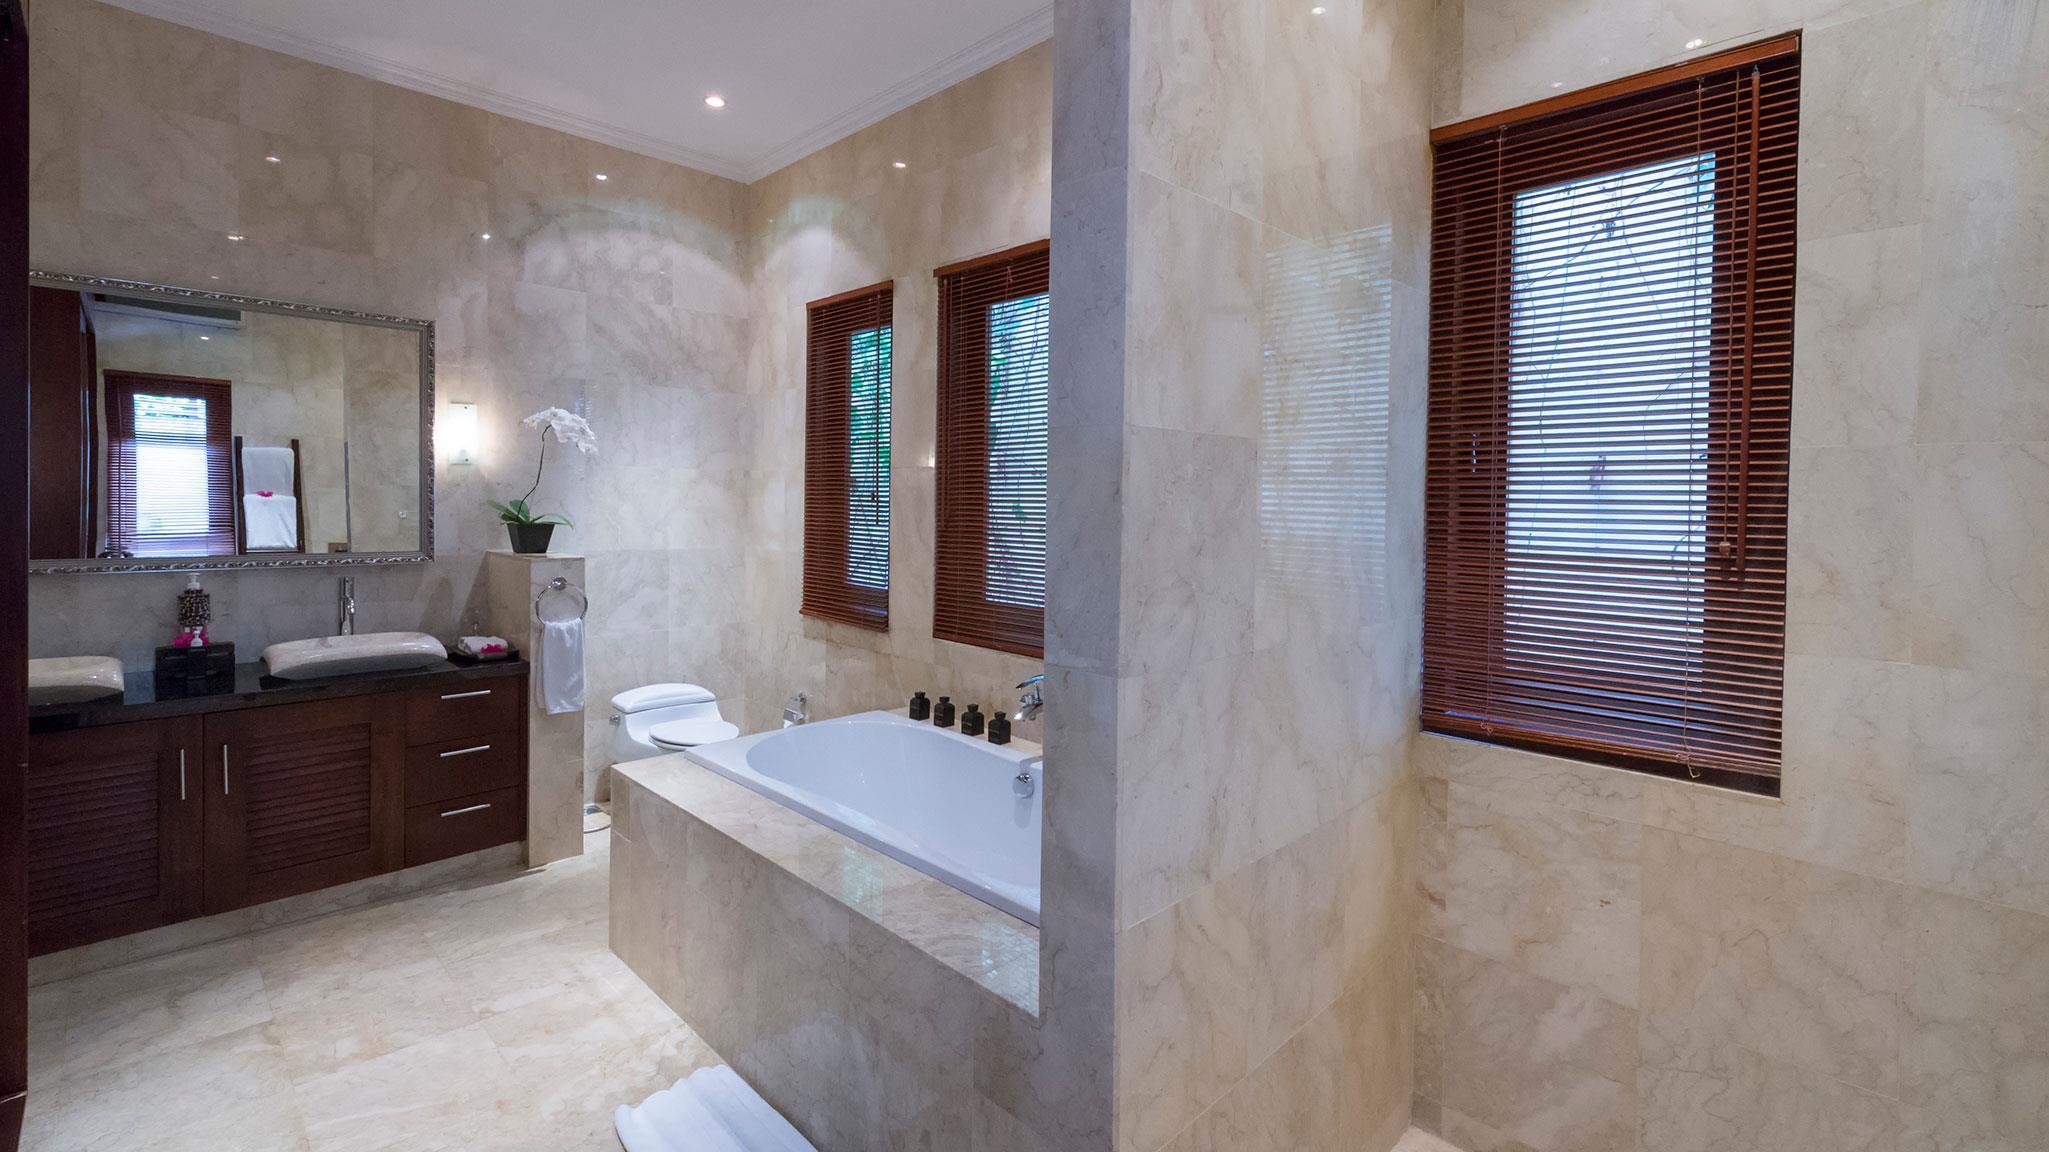 Bathroom with Windows - Villa Kalimaya Two - Seminyak, Bali